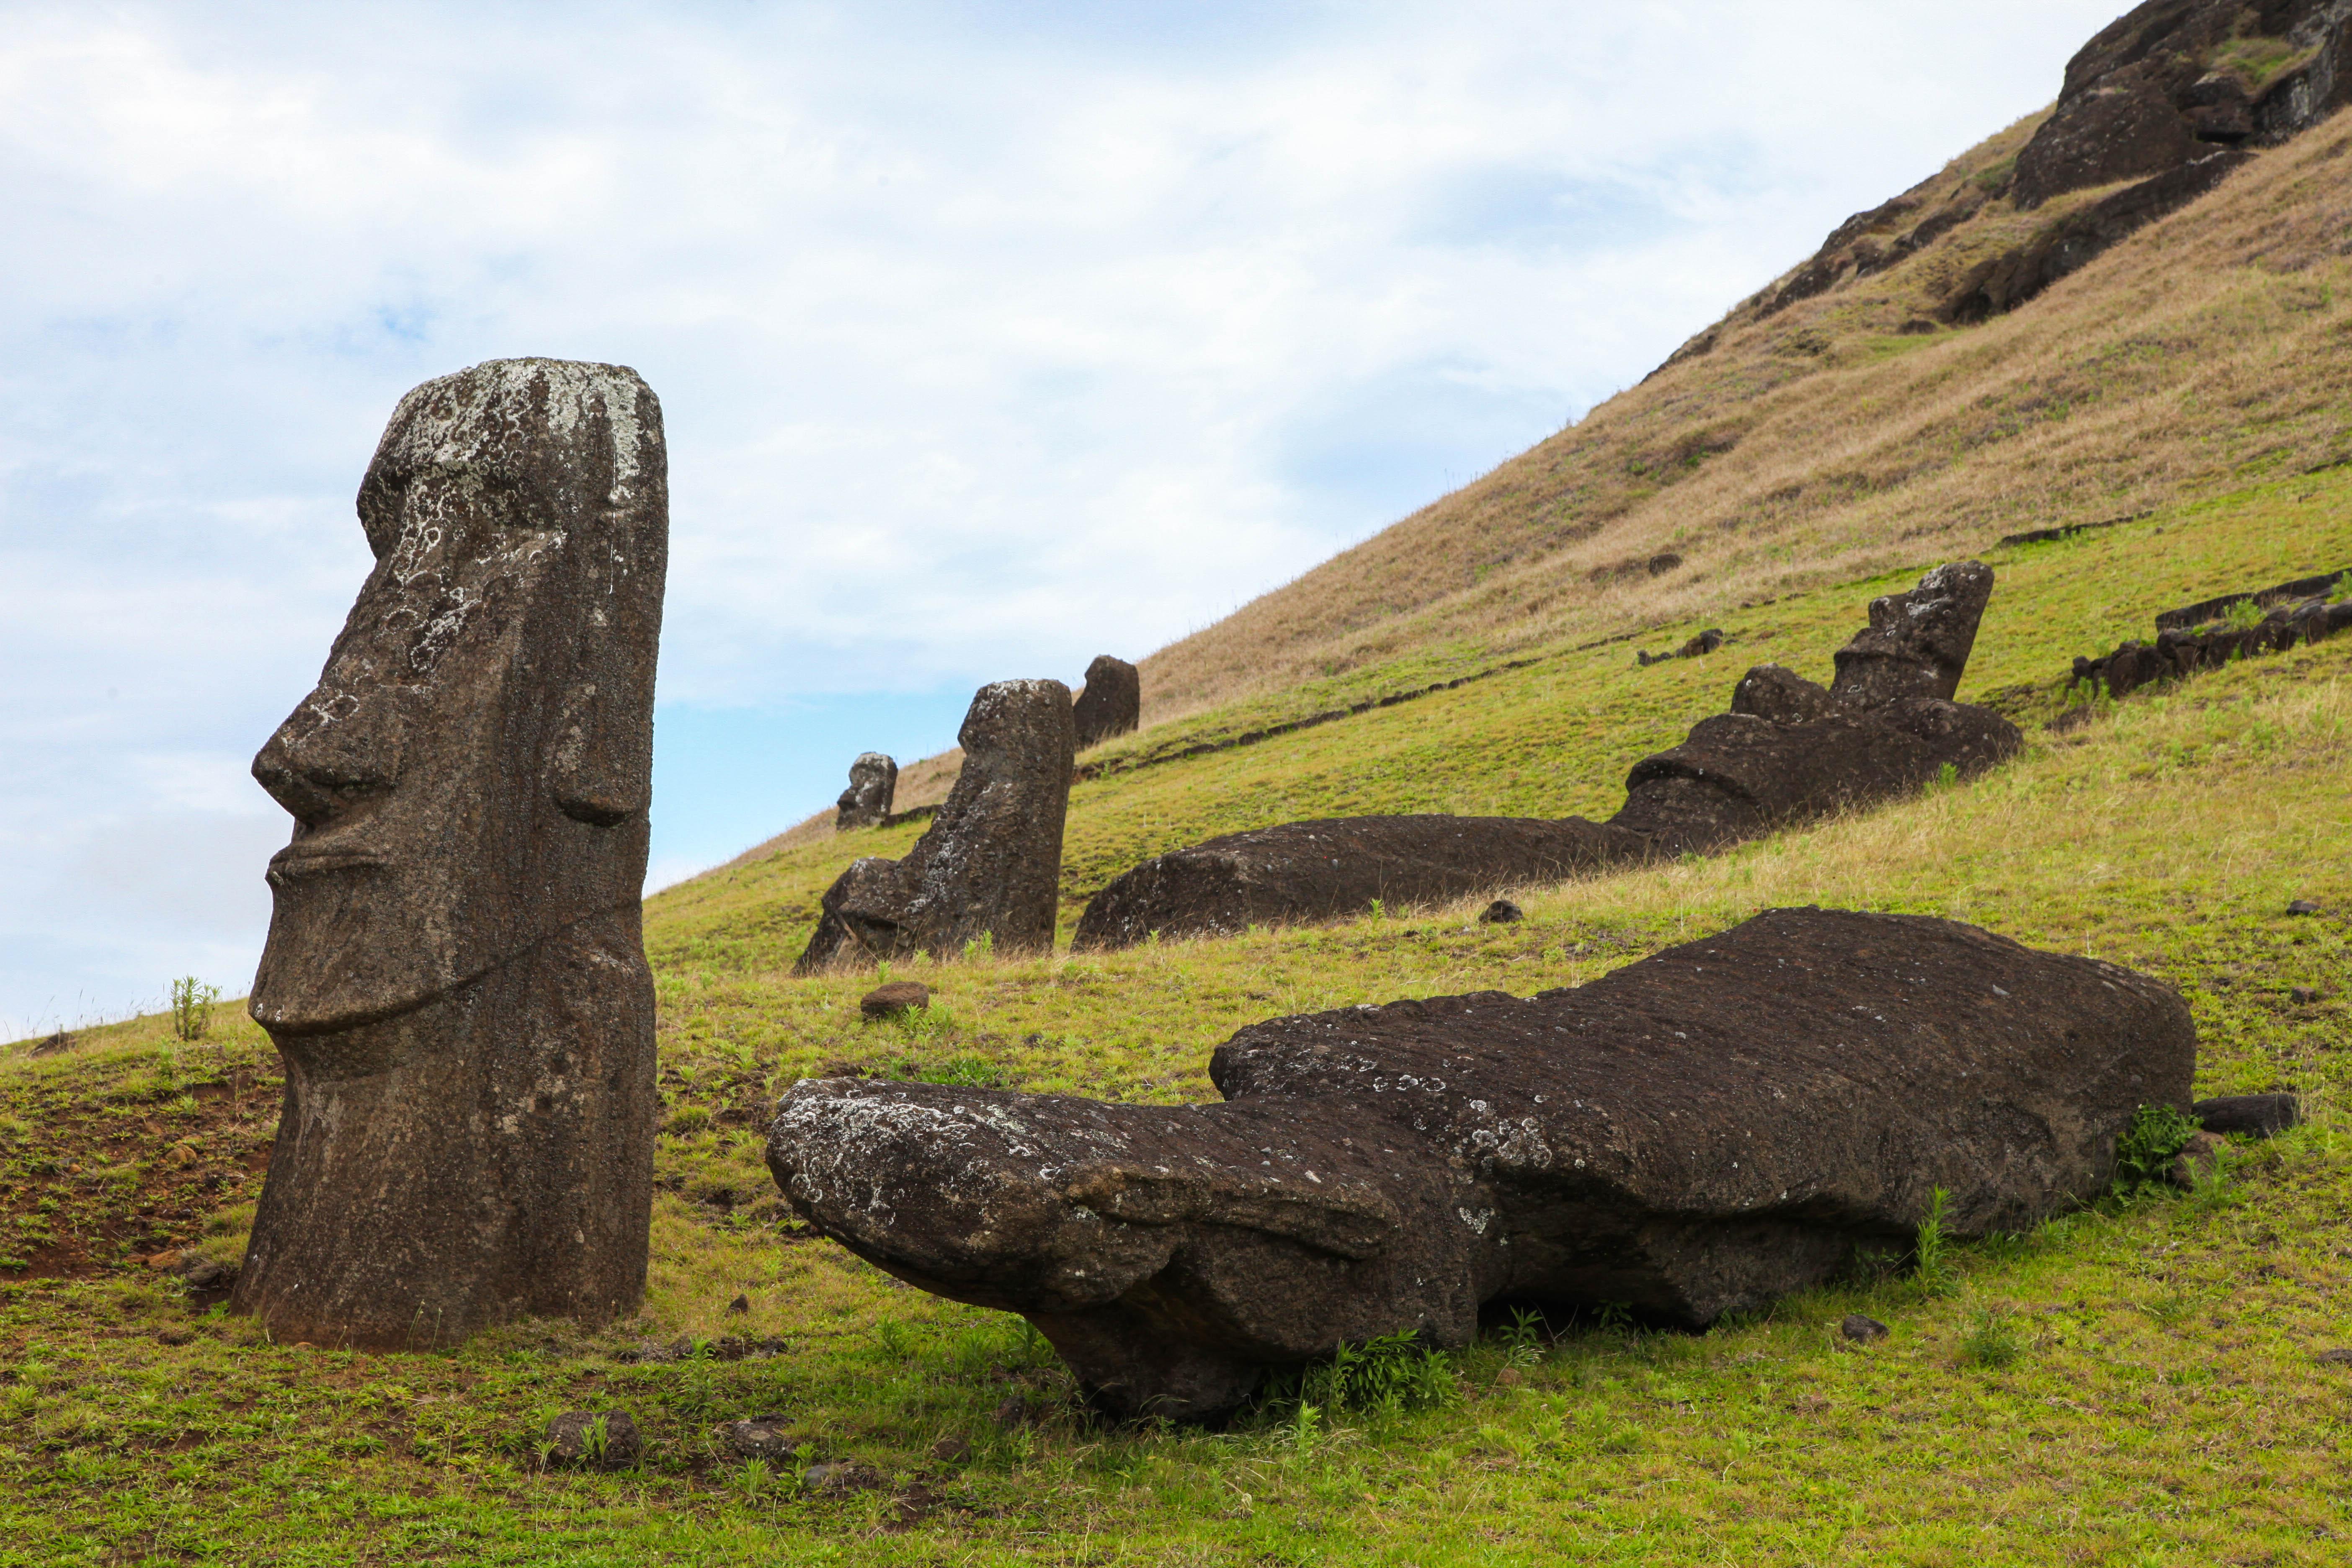 Fallen moai at Rano Raraku